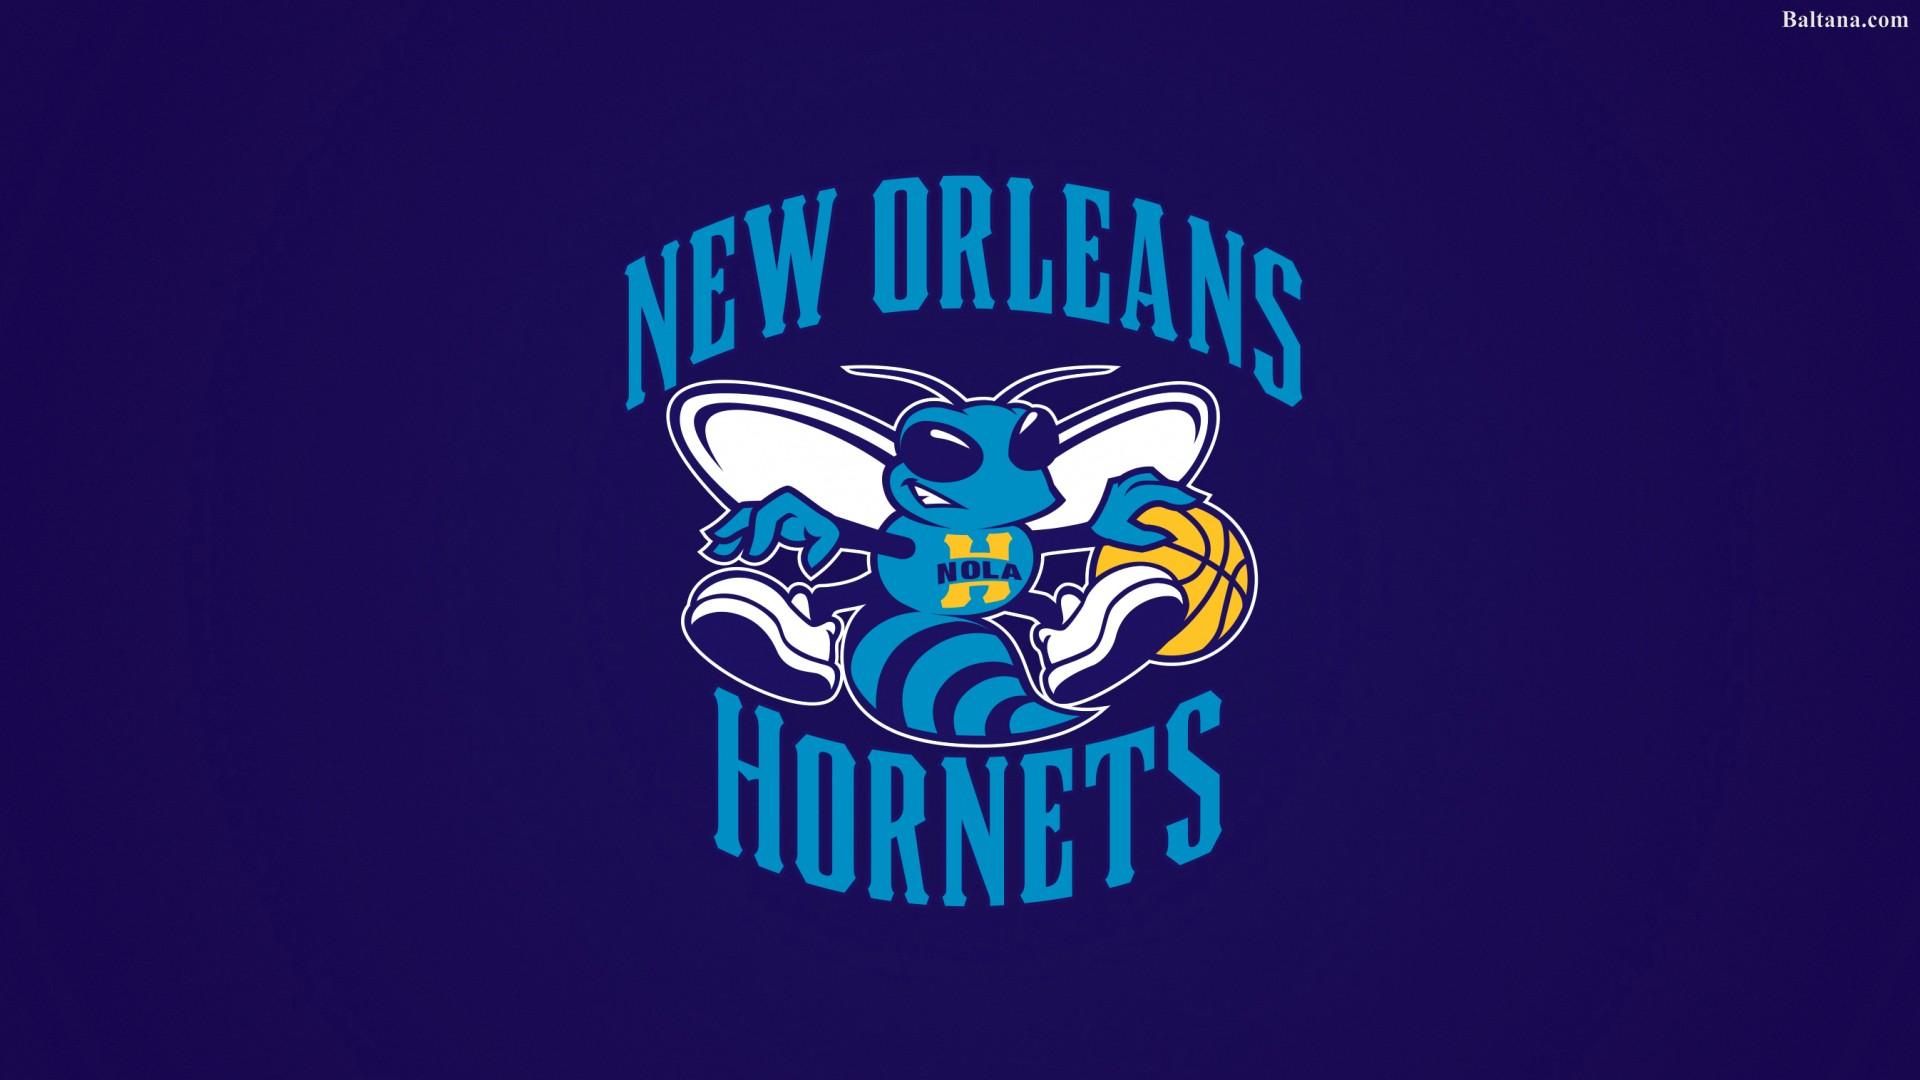 Charlotte Hornets Best Wallpaper 33426   Baltana 1920x1080